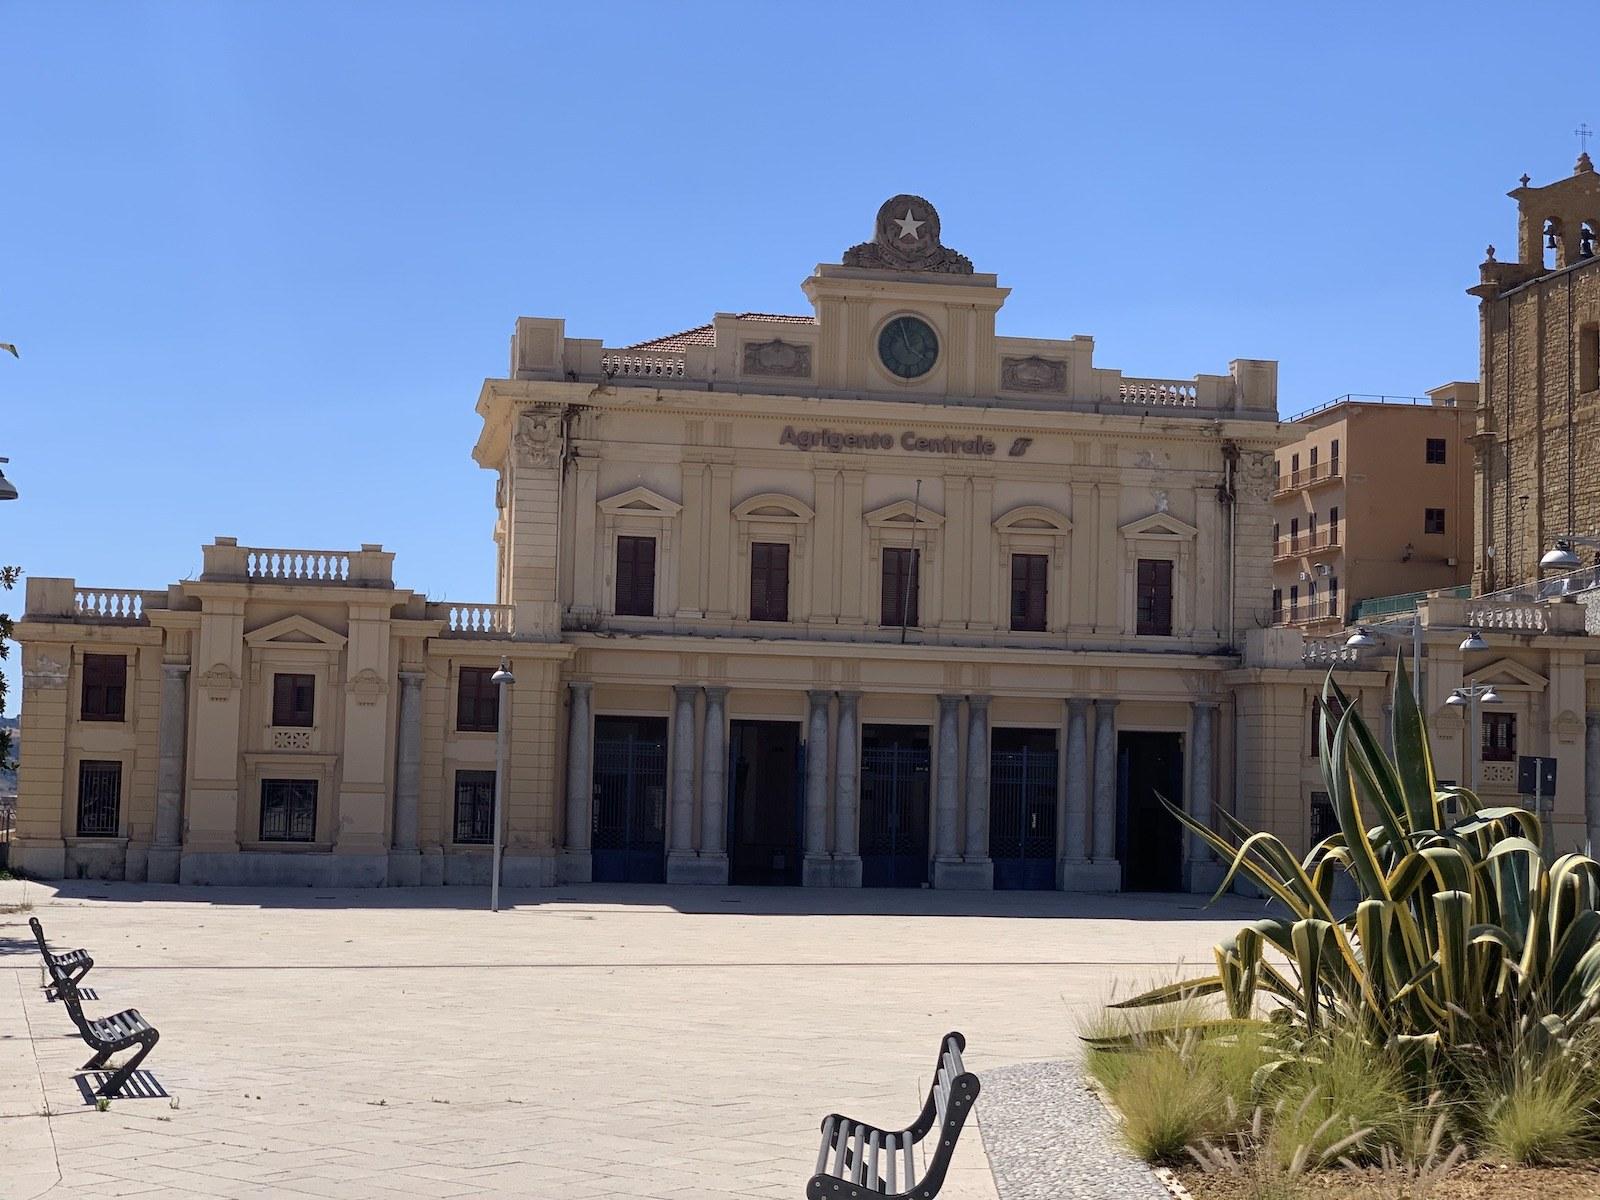 Agrigento Centrale vasútállomás